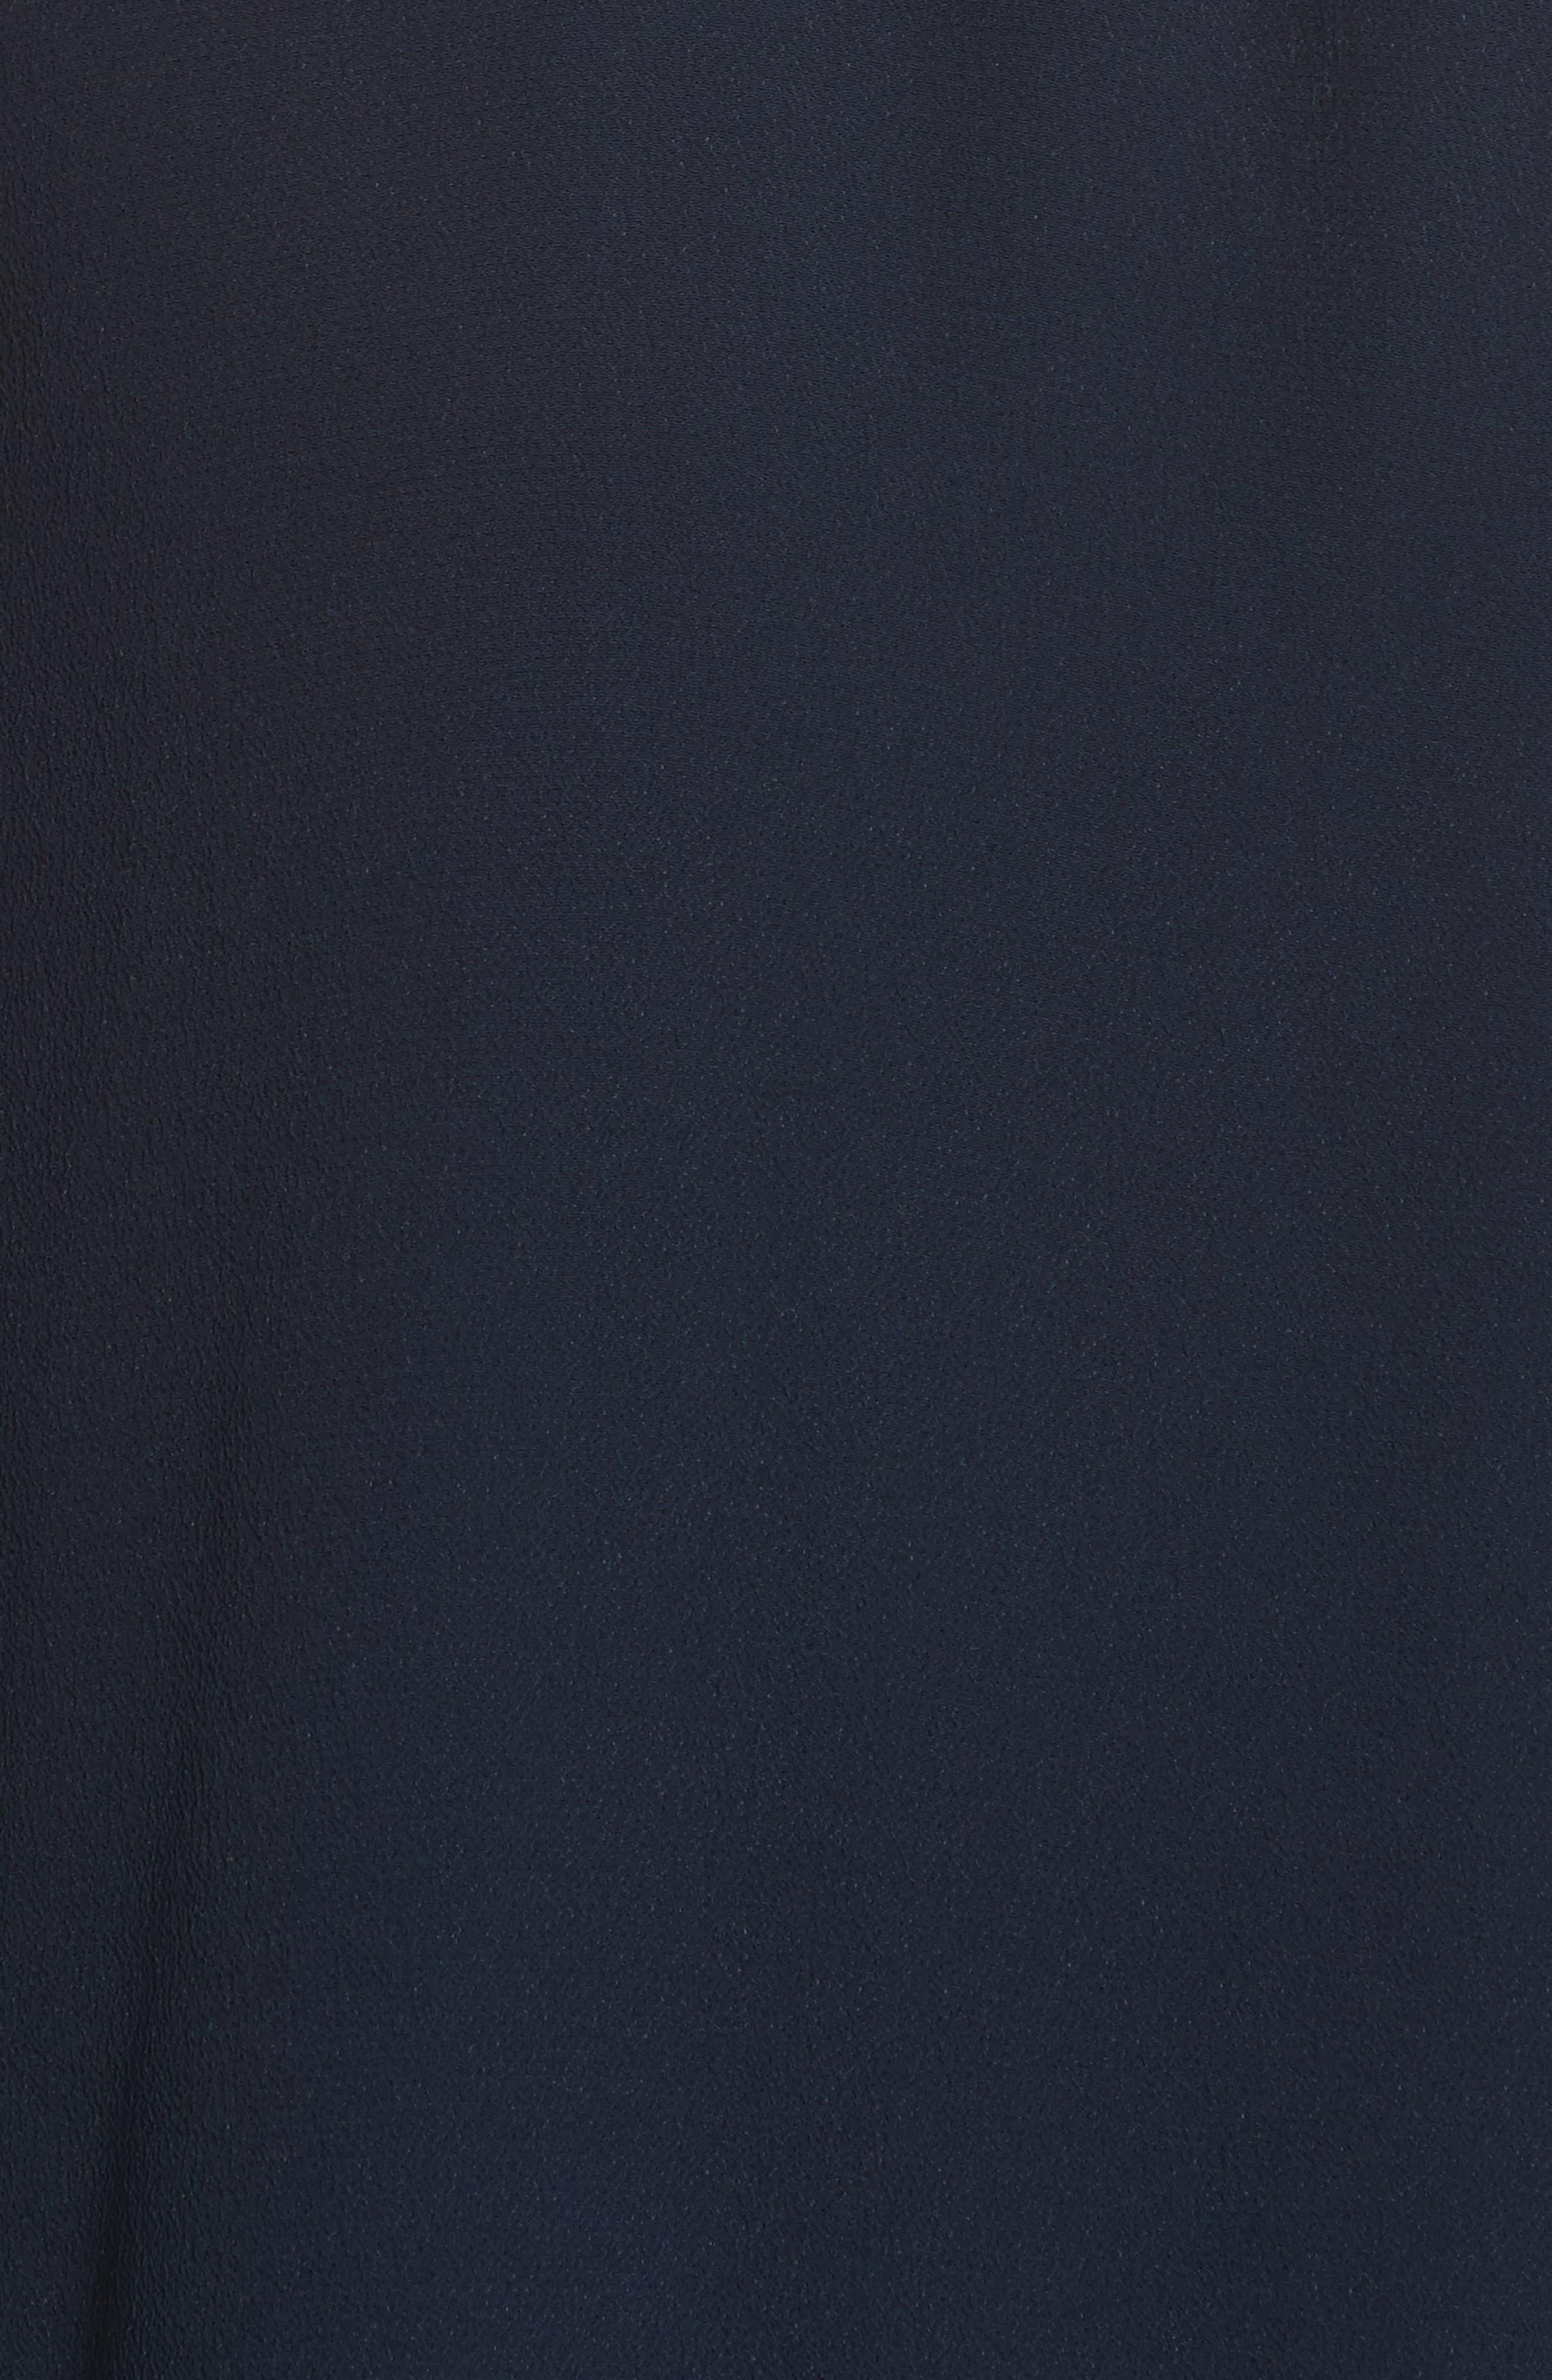 Ruffled Asymmetrical Dress,                             Alternate thumbnail 5, color,                             401